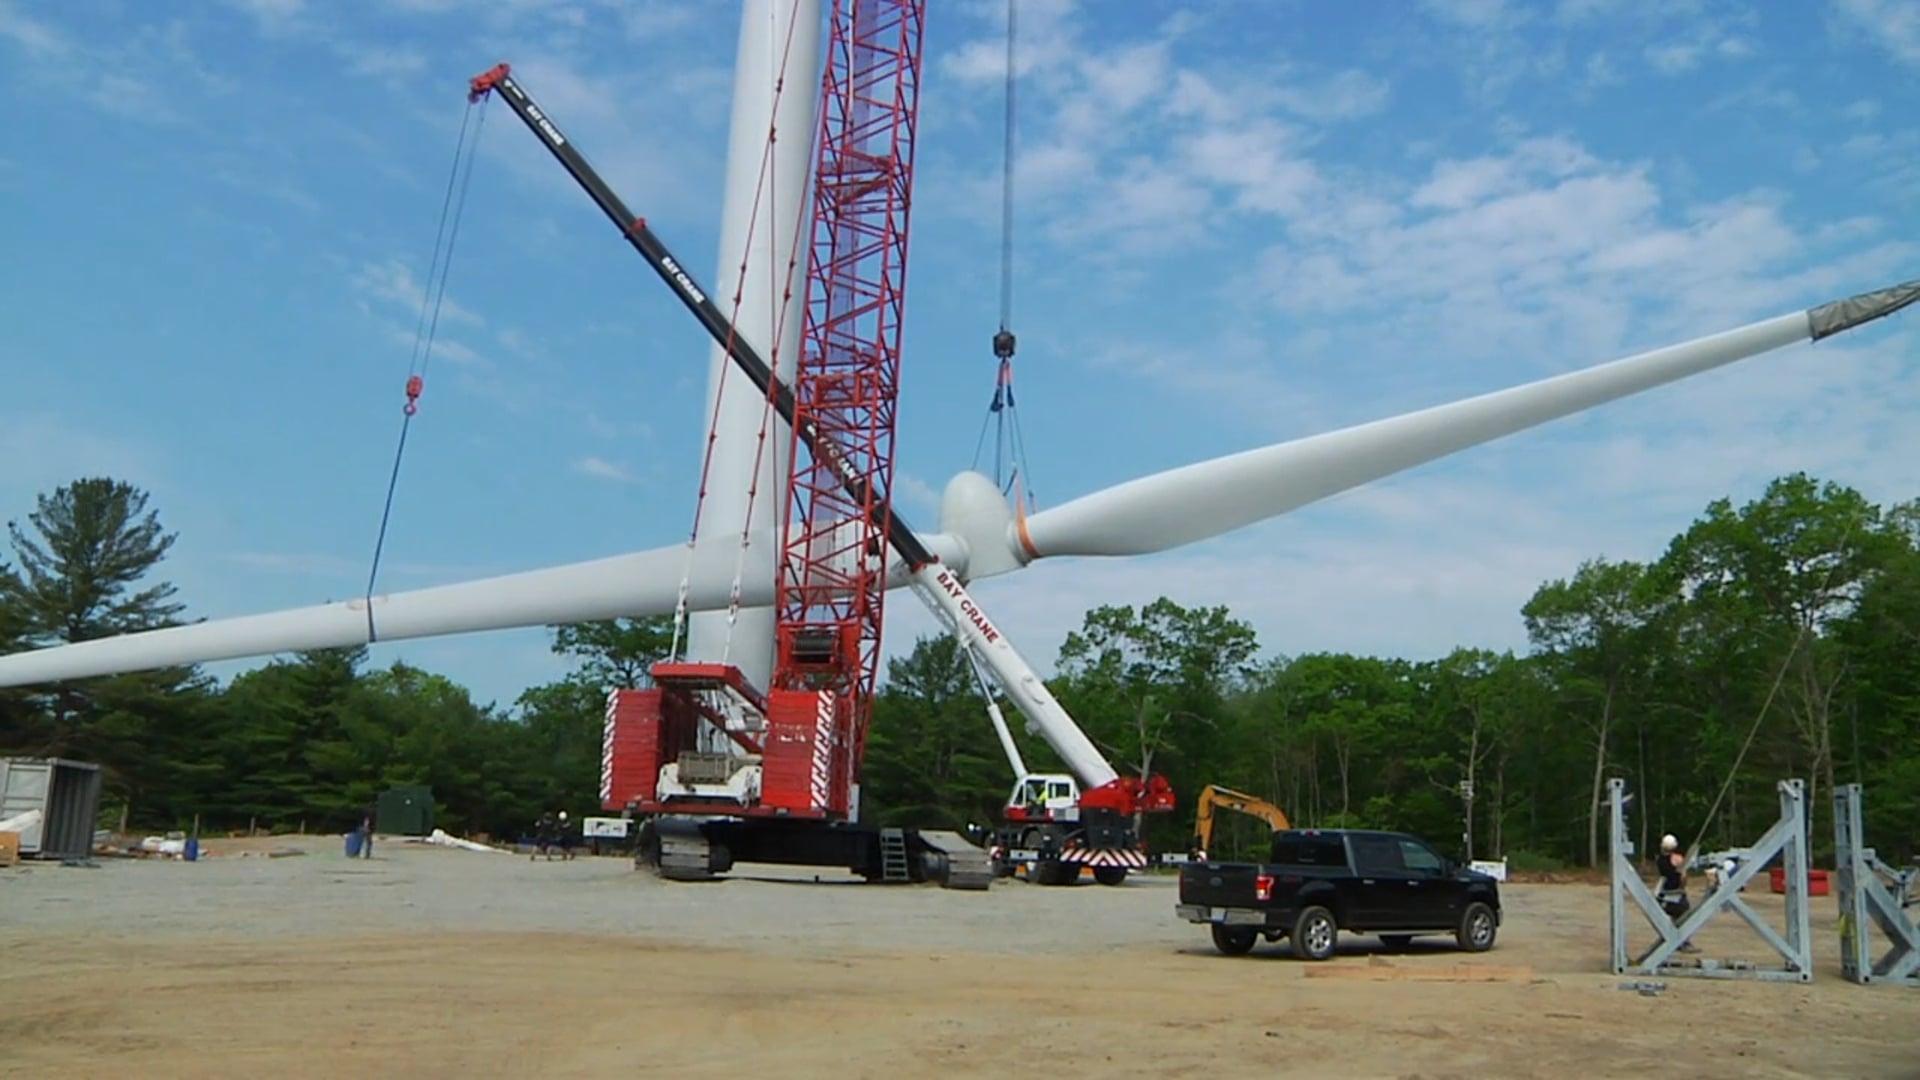 Wind Turbine Video Project